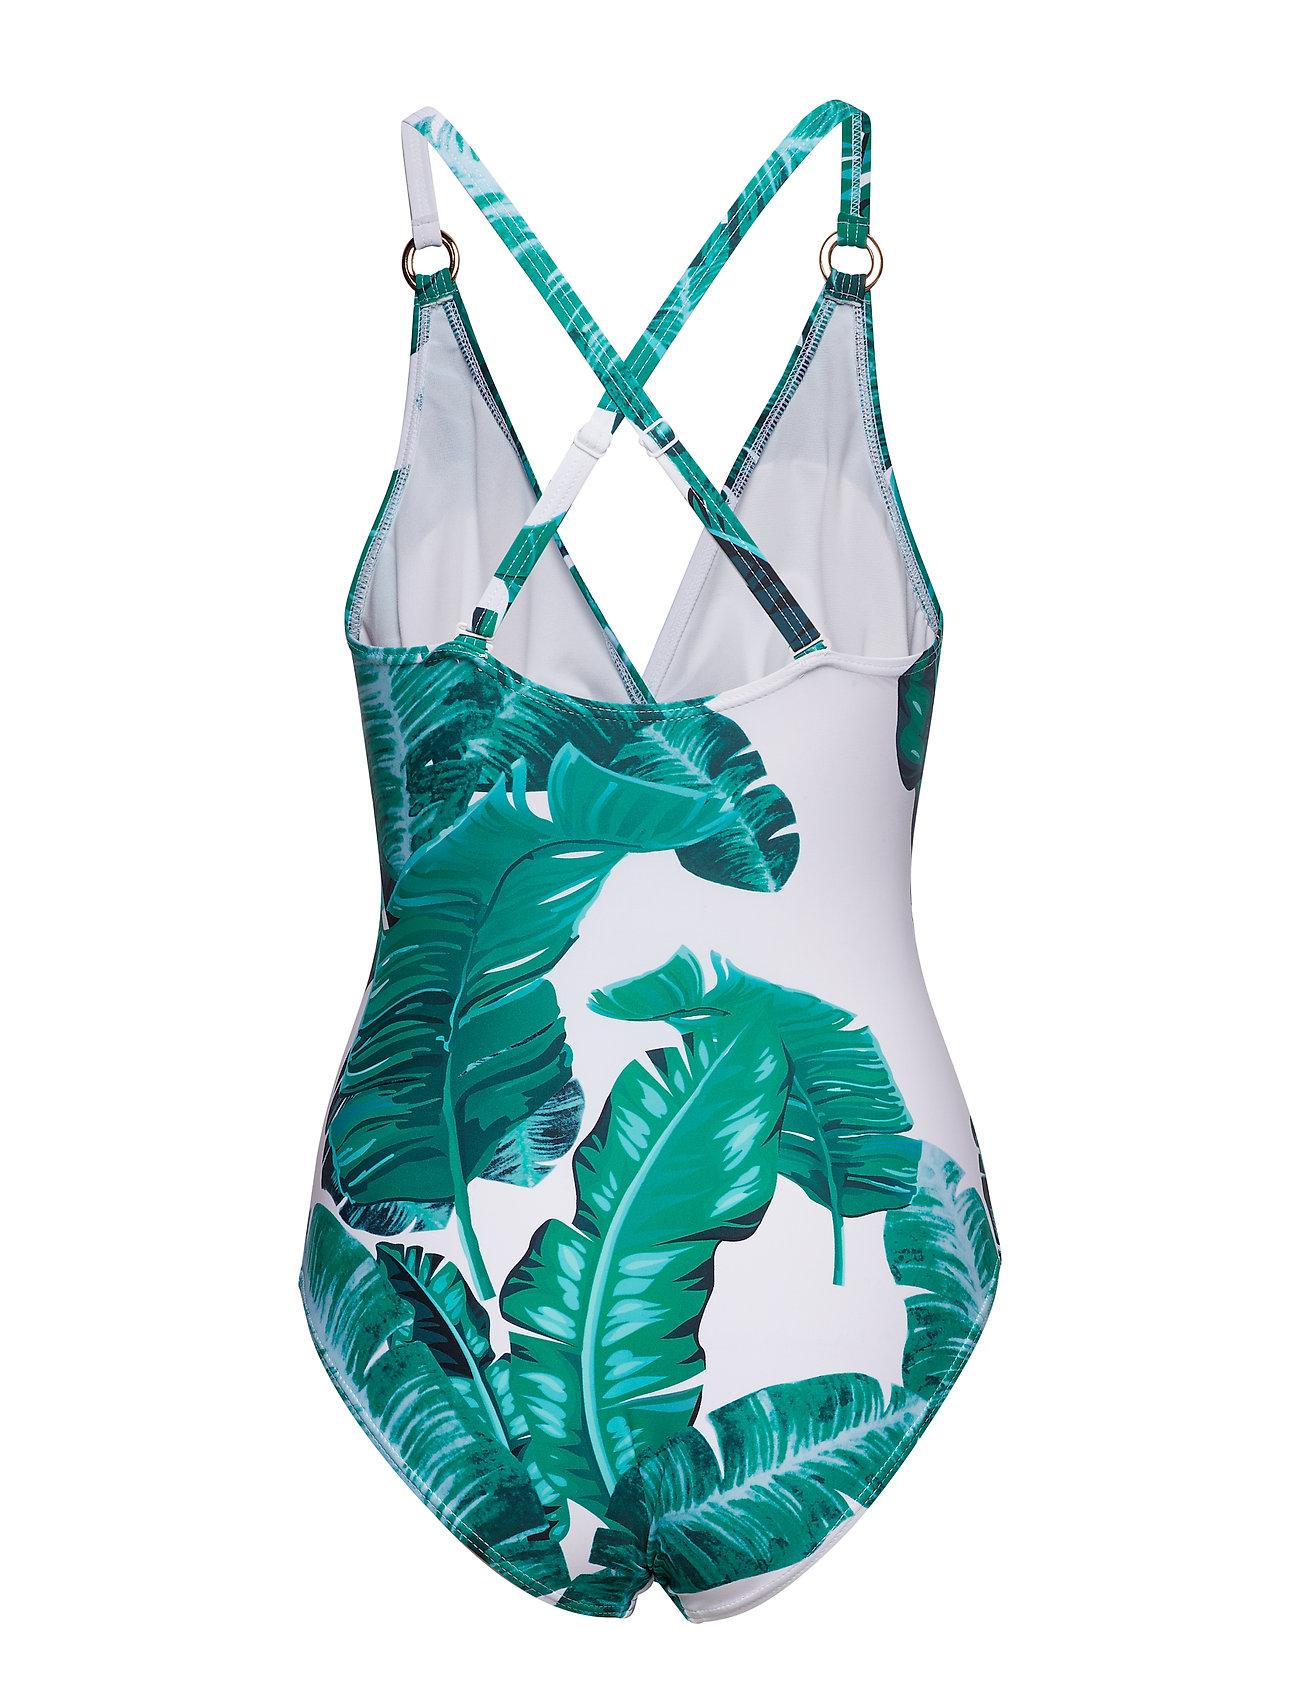 Missya    Lucca swimsuit  - Bademode    PALM PRINT